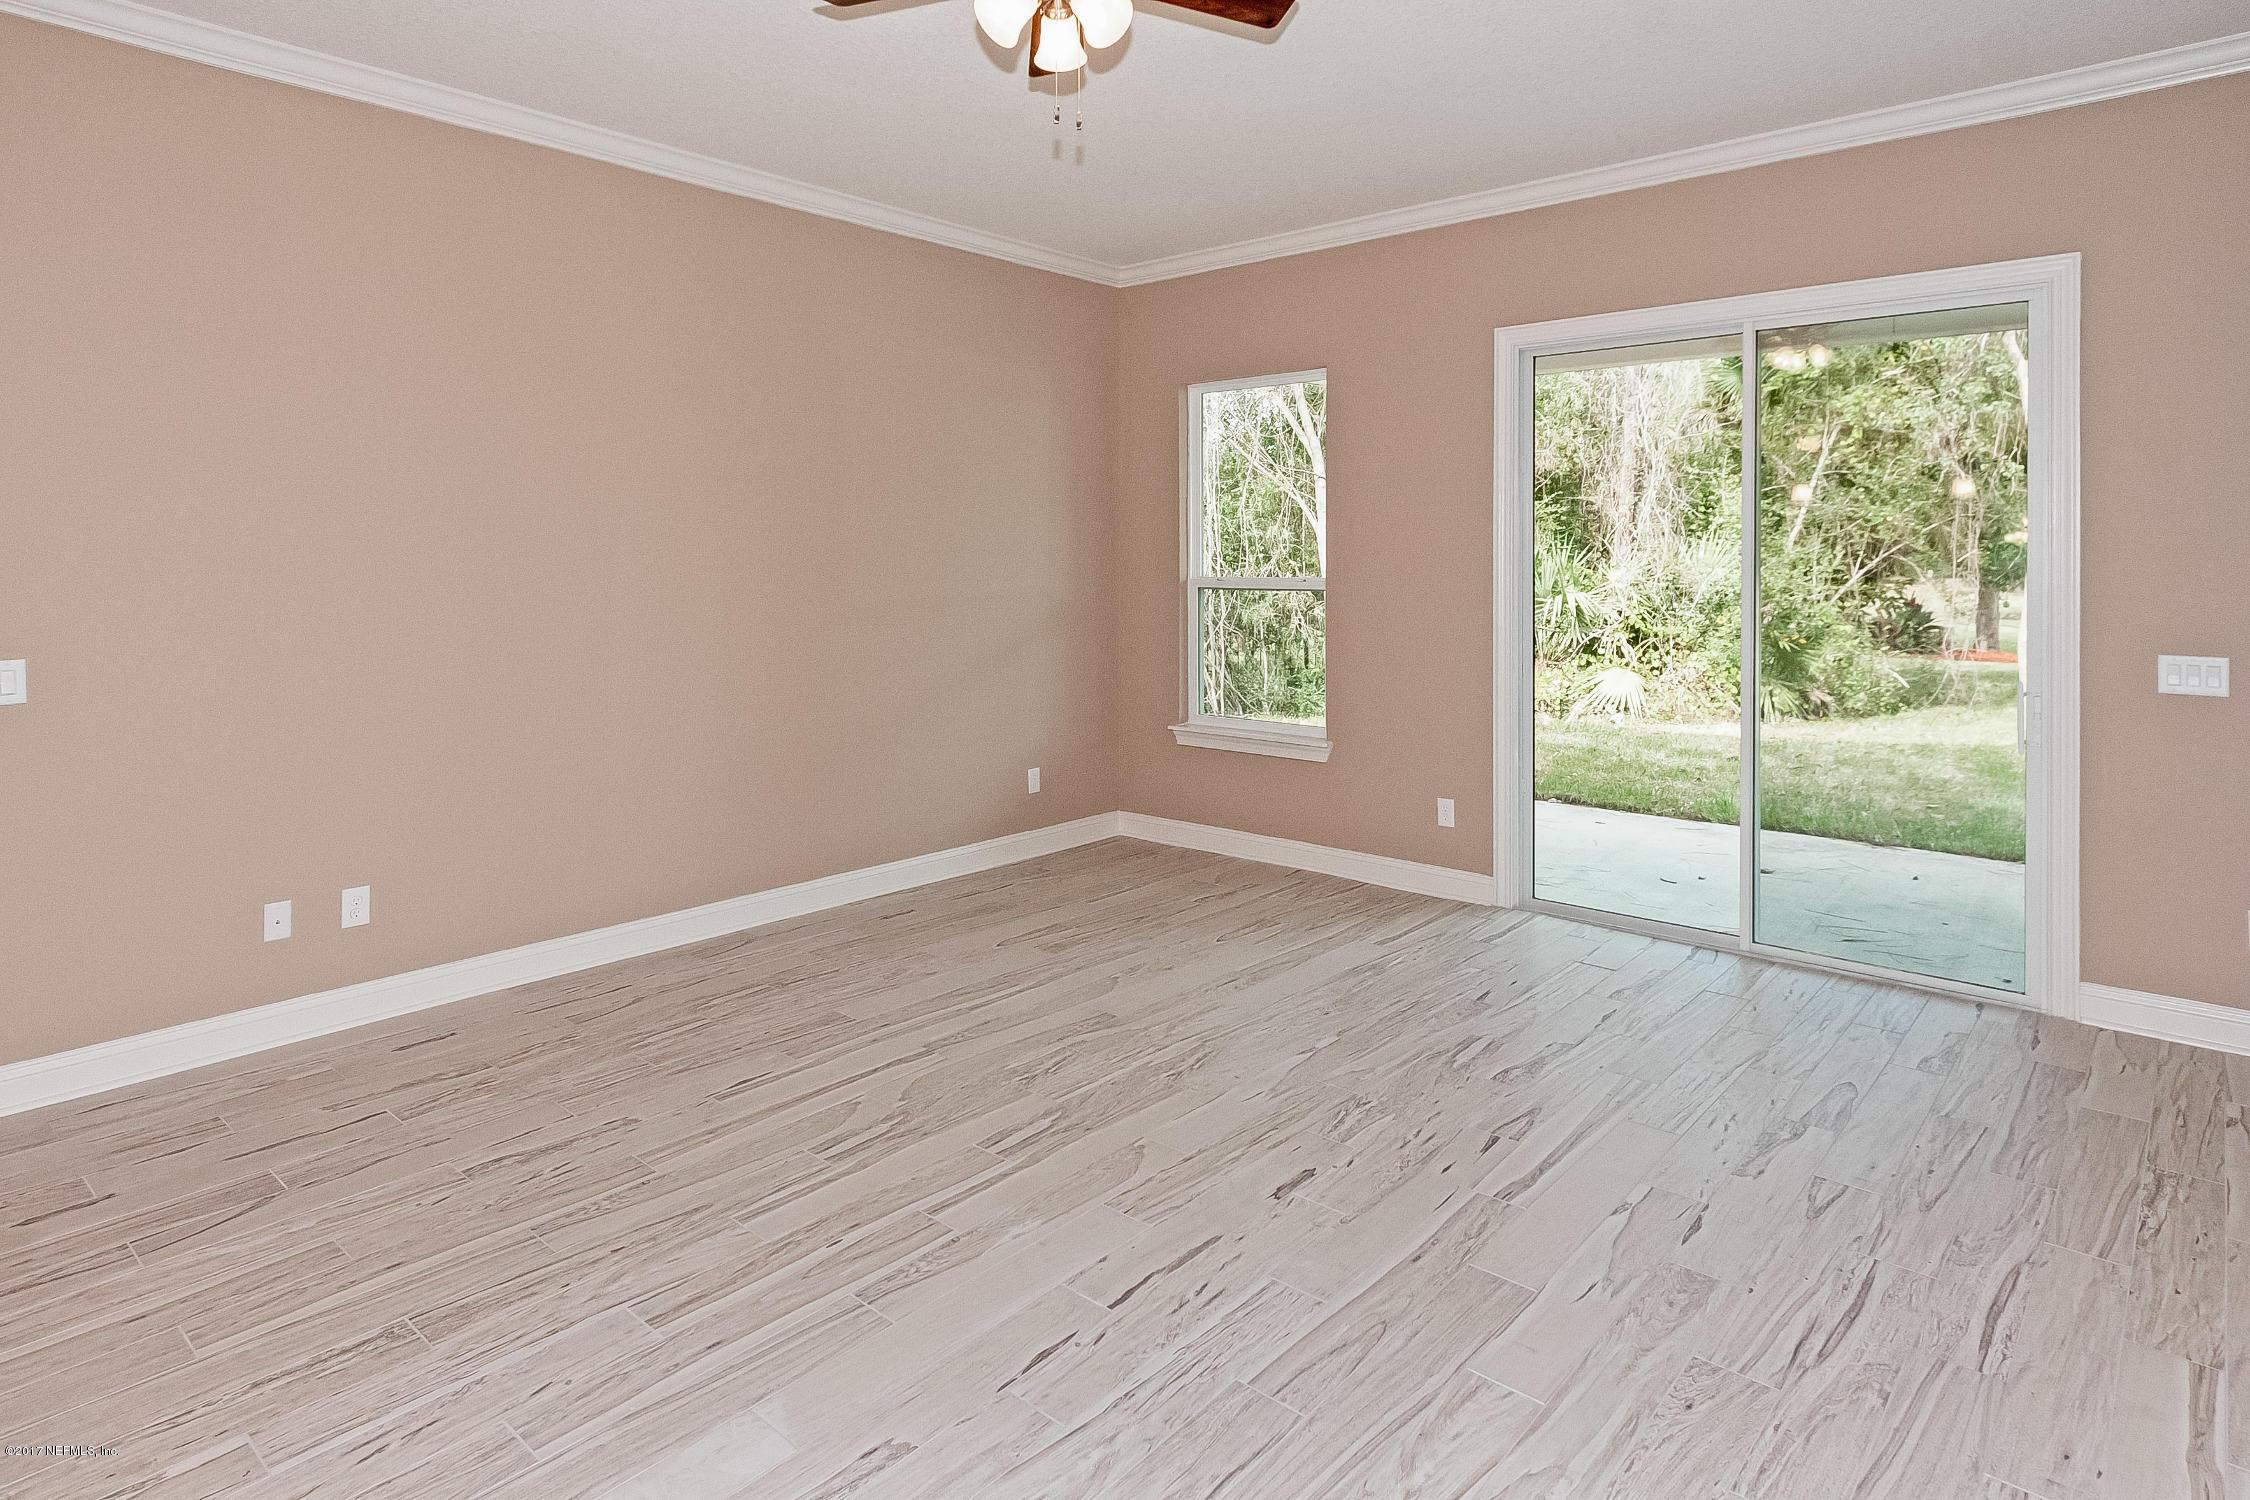 308 CRYSTAL LAKE, ST AUGUSTINE, FLORIDA 32084, 3 Bedrooms Bedrooms, ,2 BathroomsBathrooms,Residential - single family,For sale,CRYSTAL LAKE,941878